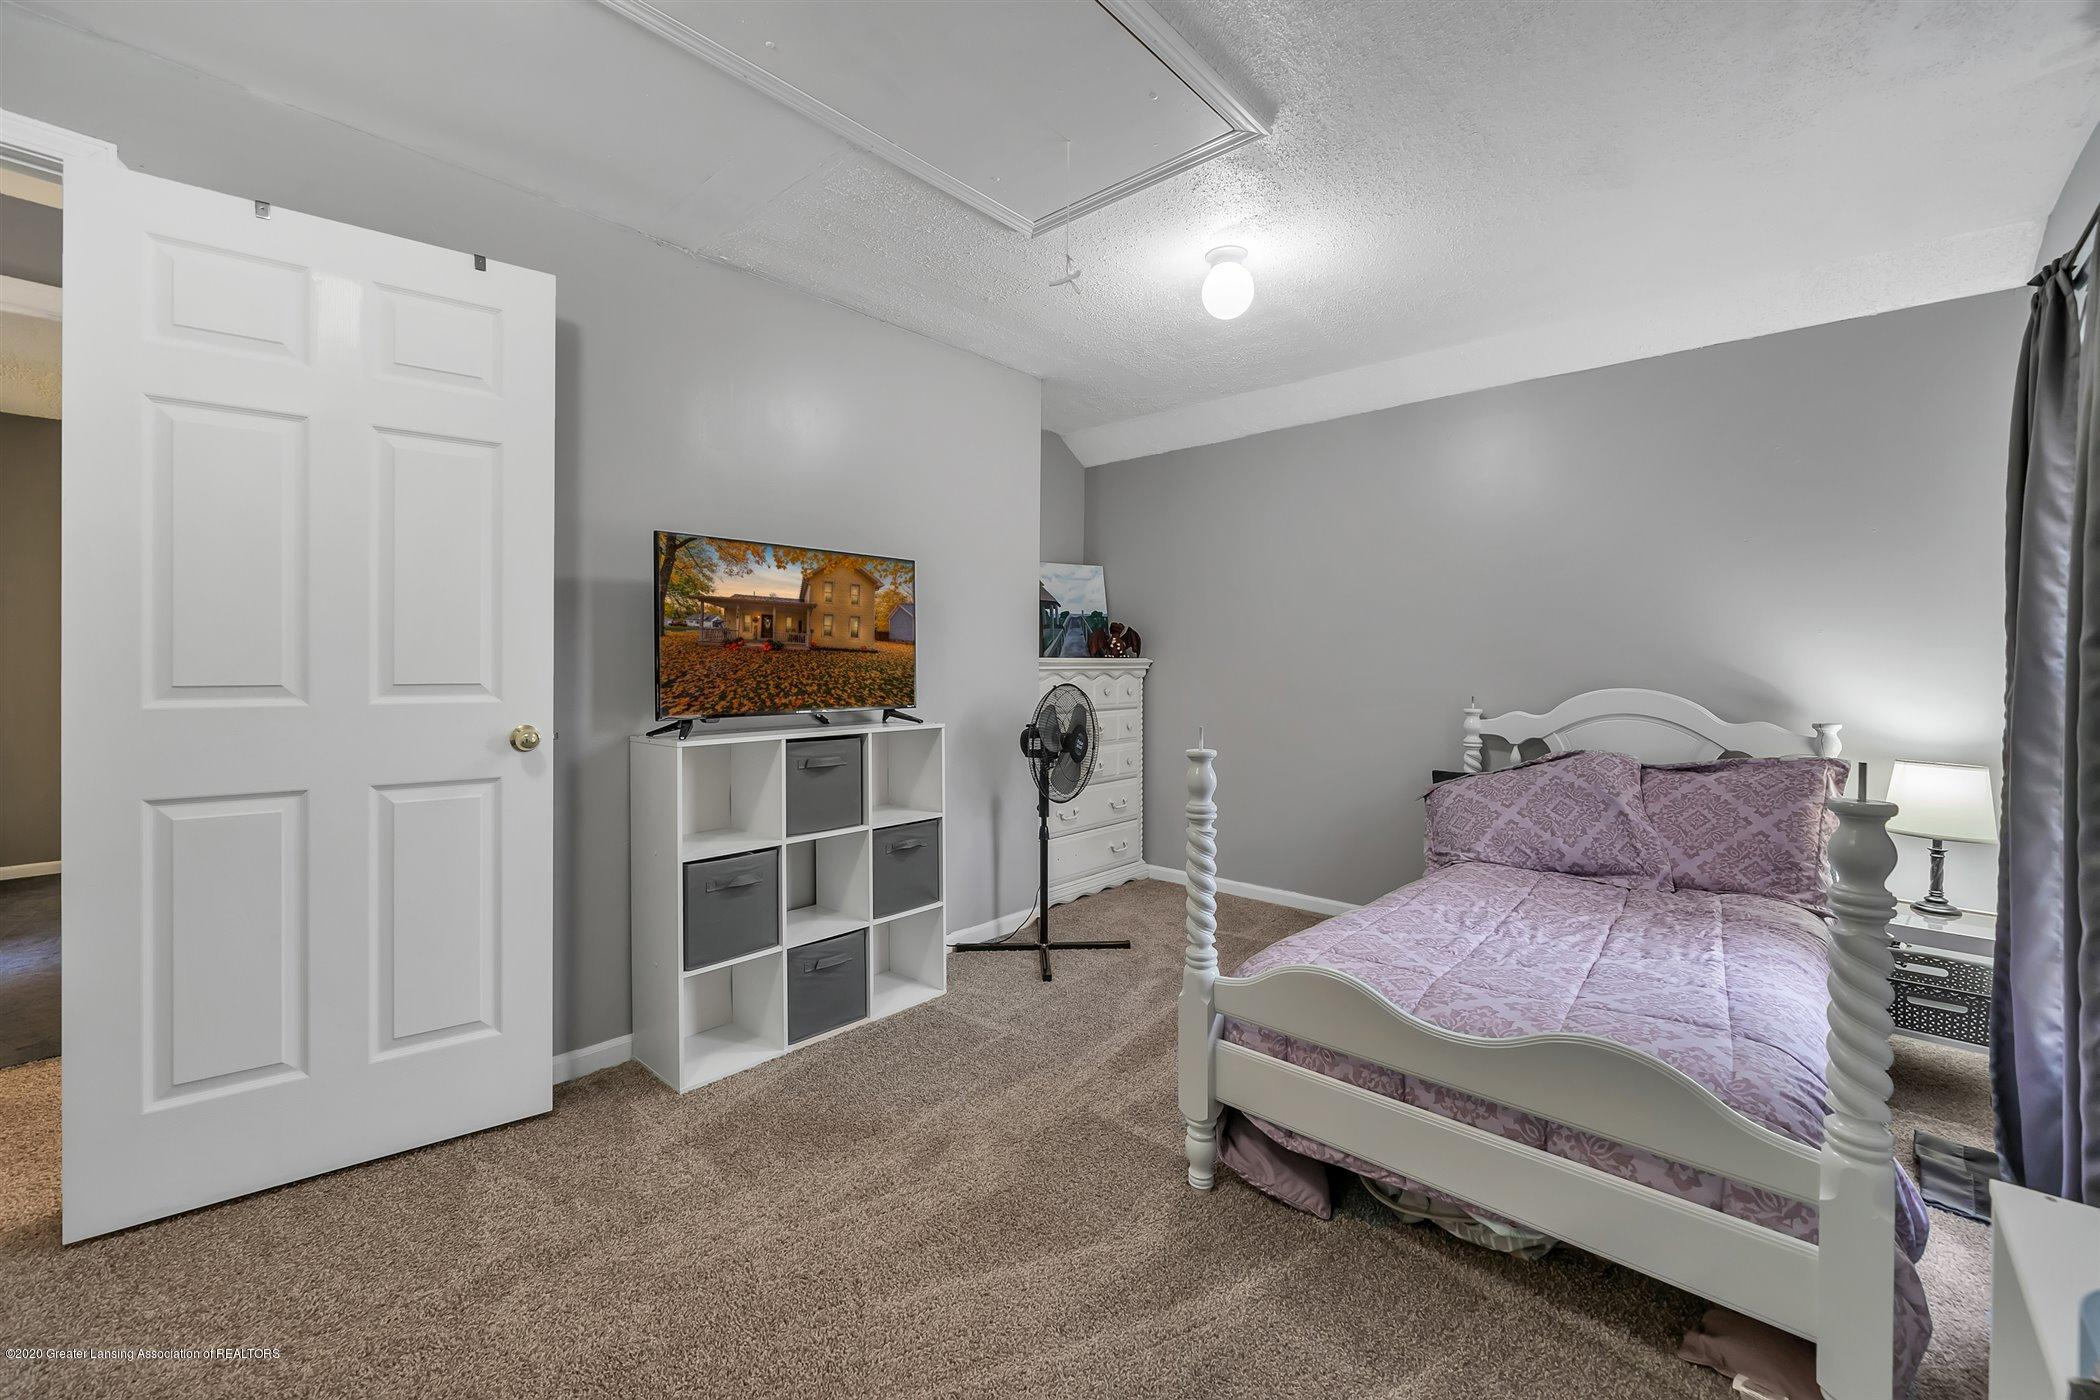 328 E 2nd St - (20) SECOND FLOOR Bedroom 2 - 21